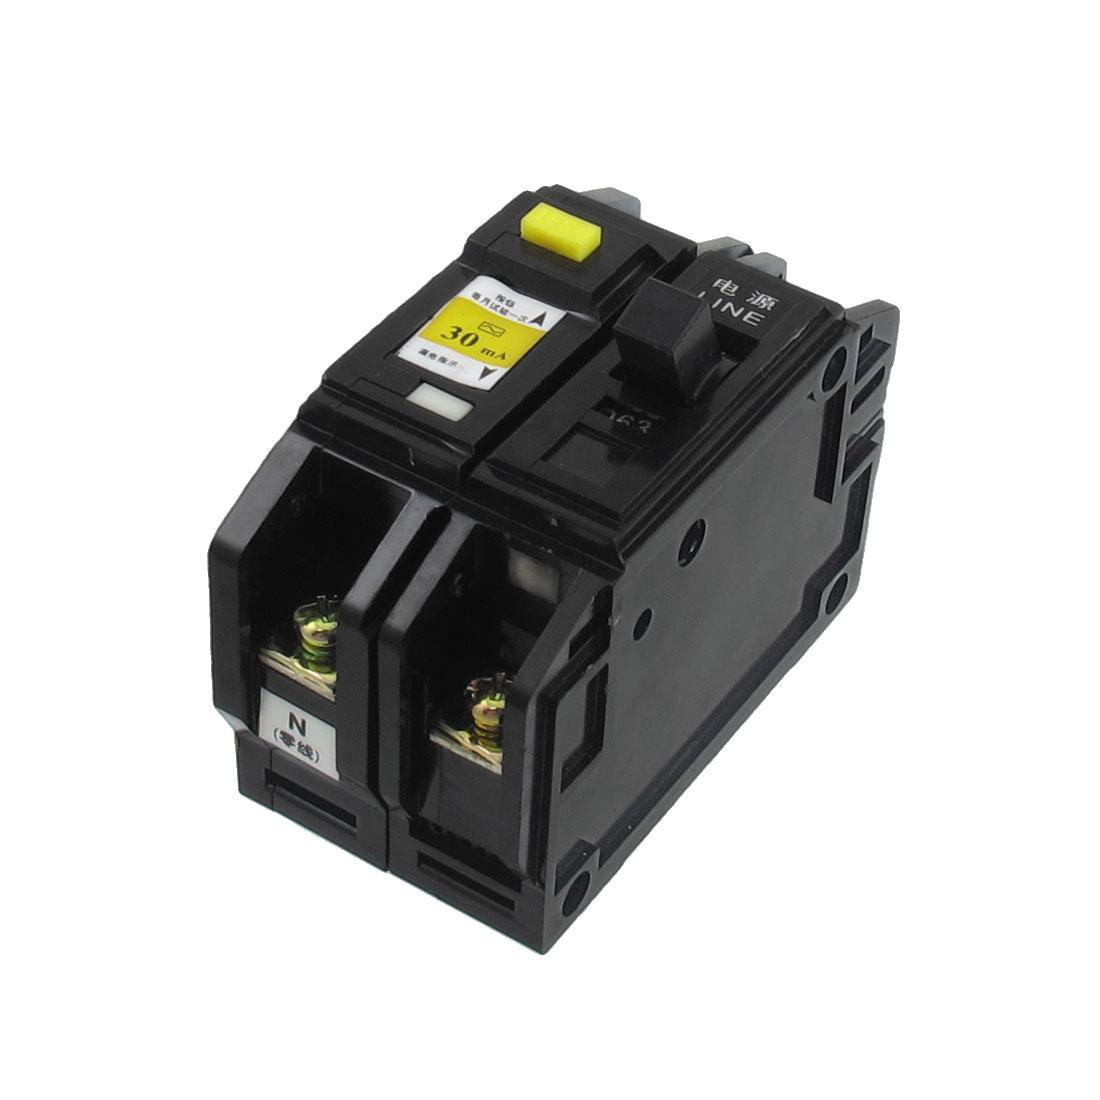 DZ12LE AC 220V/380V 63A 1P+N ELCB Earth Leakage Circuit Breaker